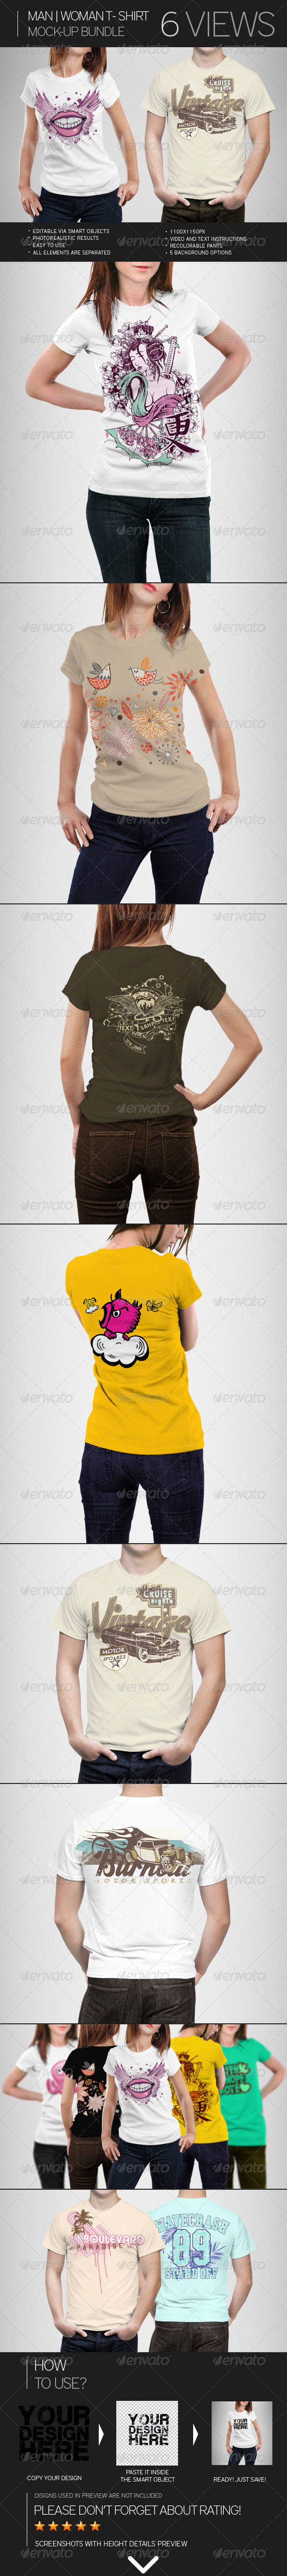 GraphicRiver Man Woman T-Shirt Mock-Up Bundle 7666529